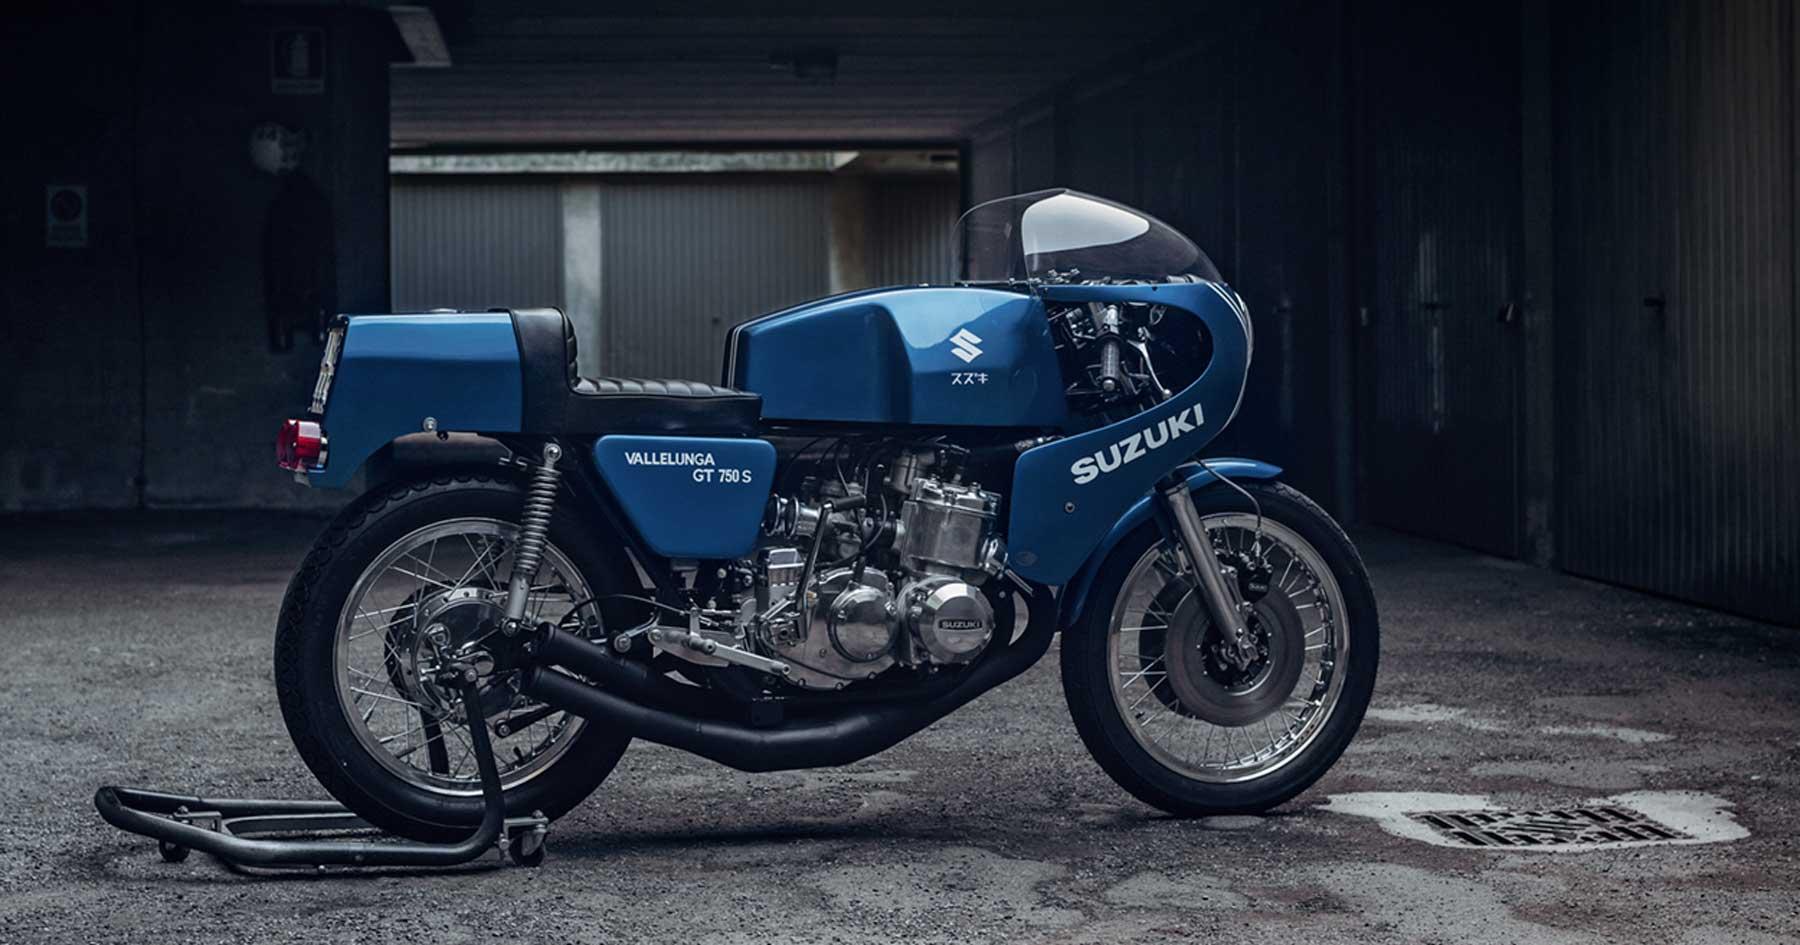 Blast from the past: A Suzuki Vallelunga roars again